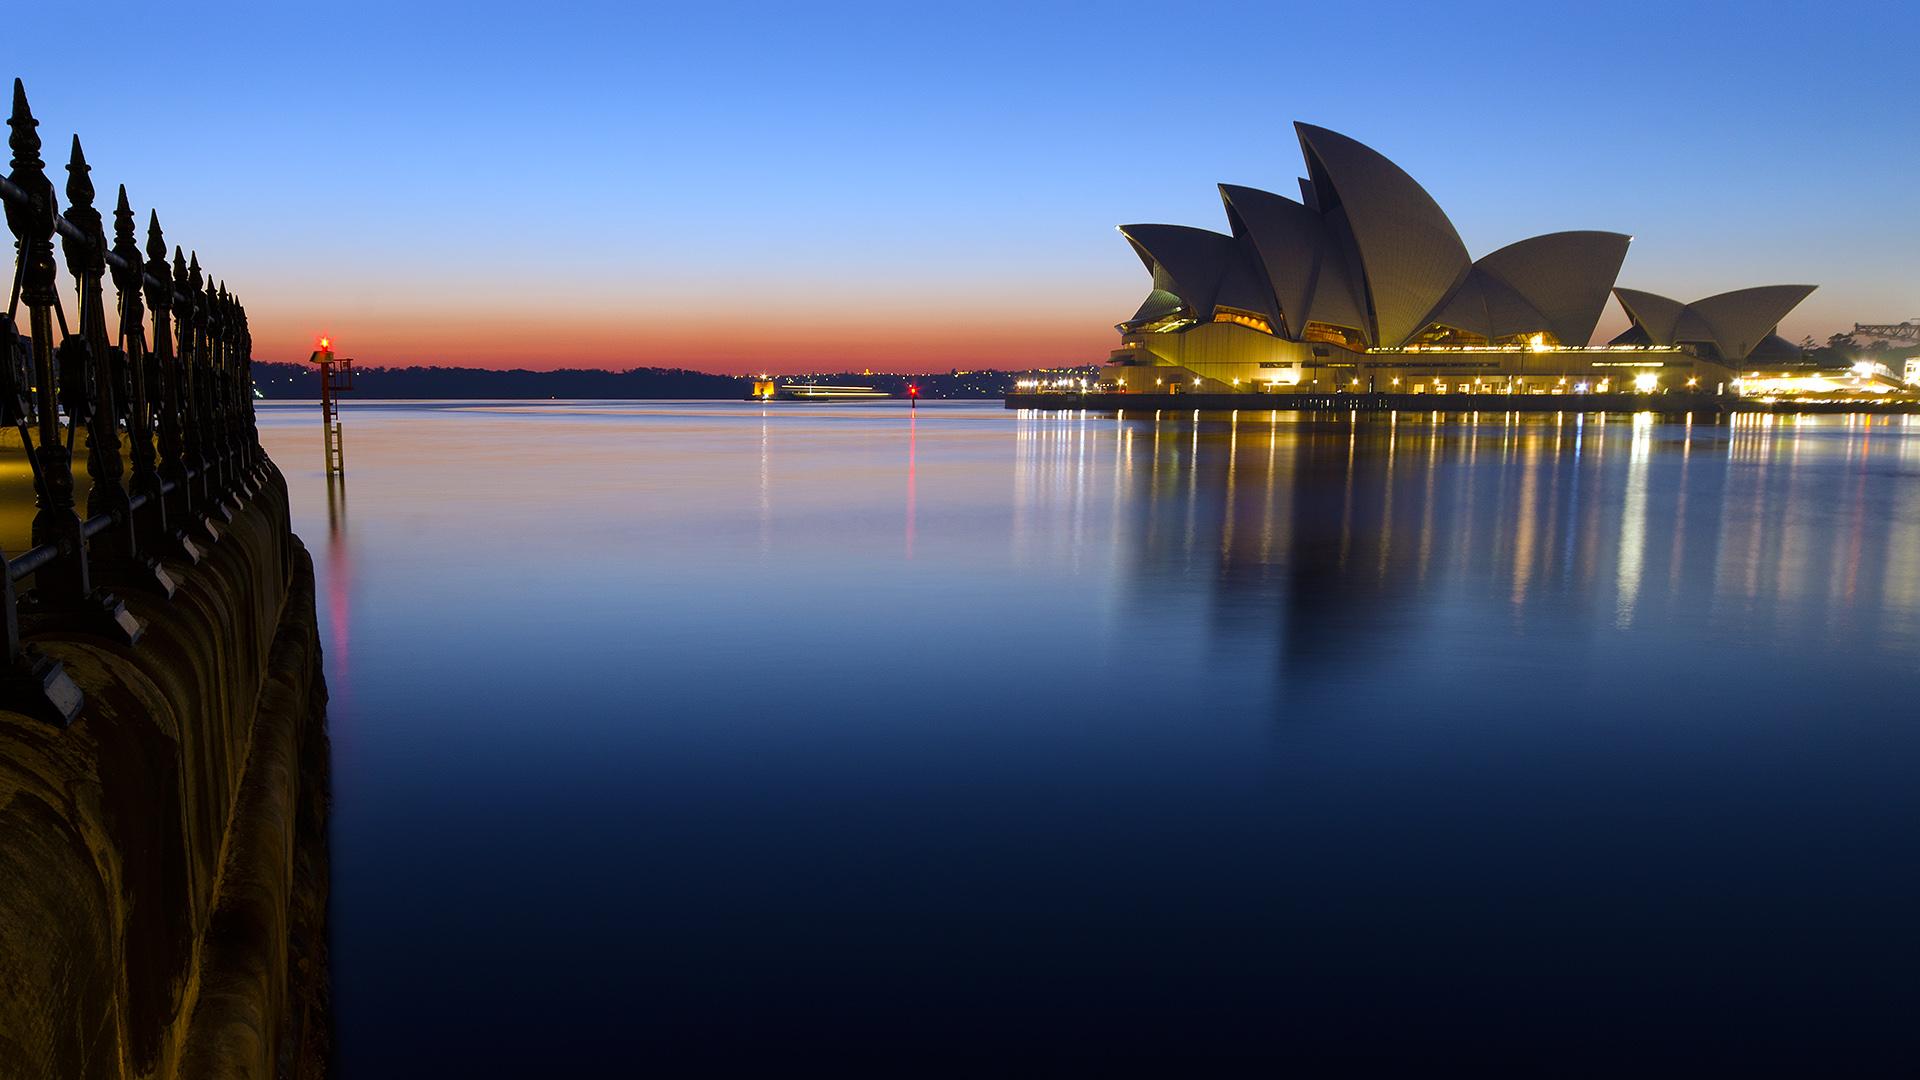 Sydney Opera House Sunset Wallpaper Travel HD Wallpapers 1920x1080